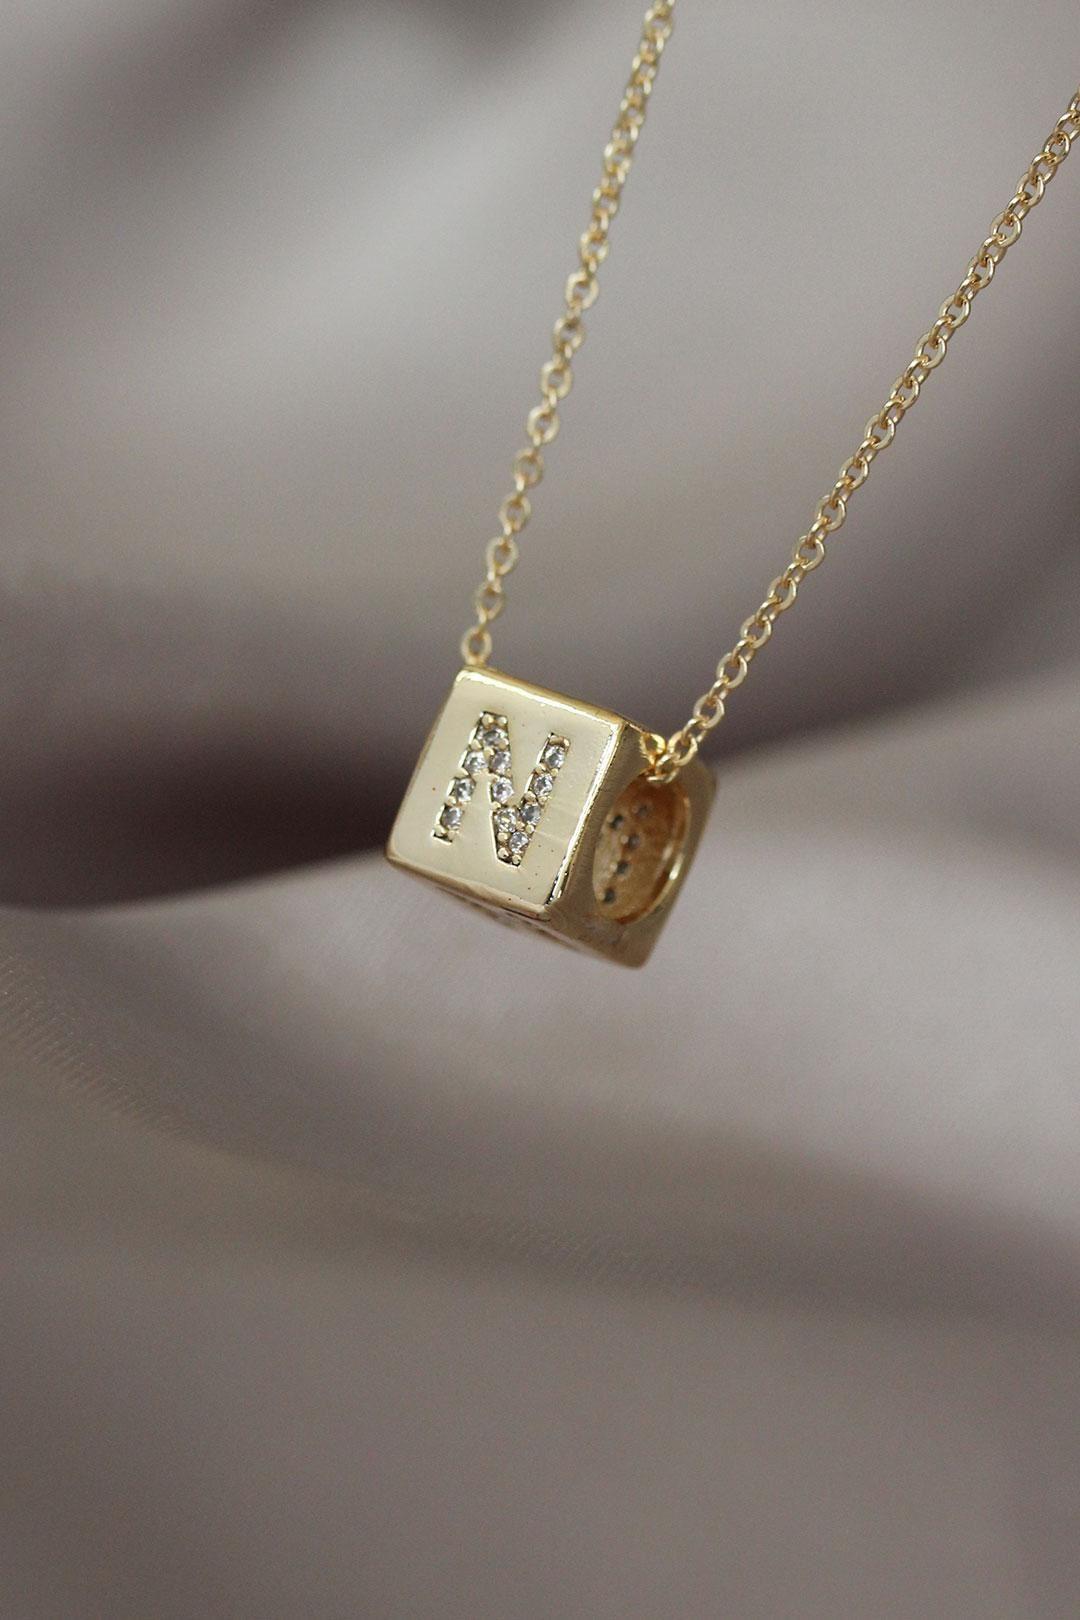 Küp Model Gold Renk Zirkon Taşlı N Harfli Kolye